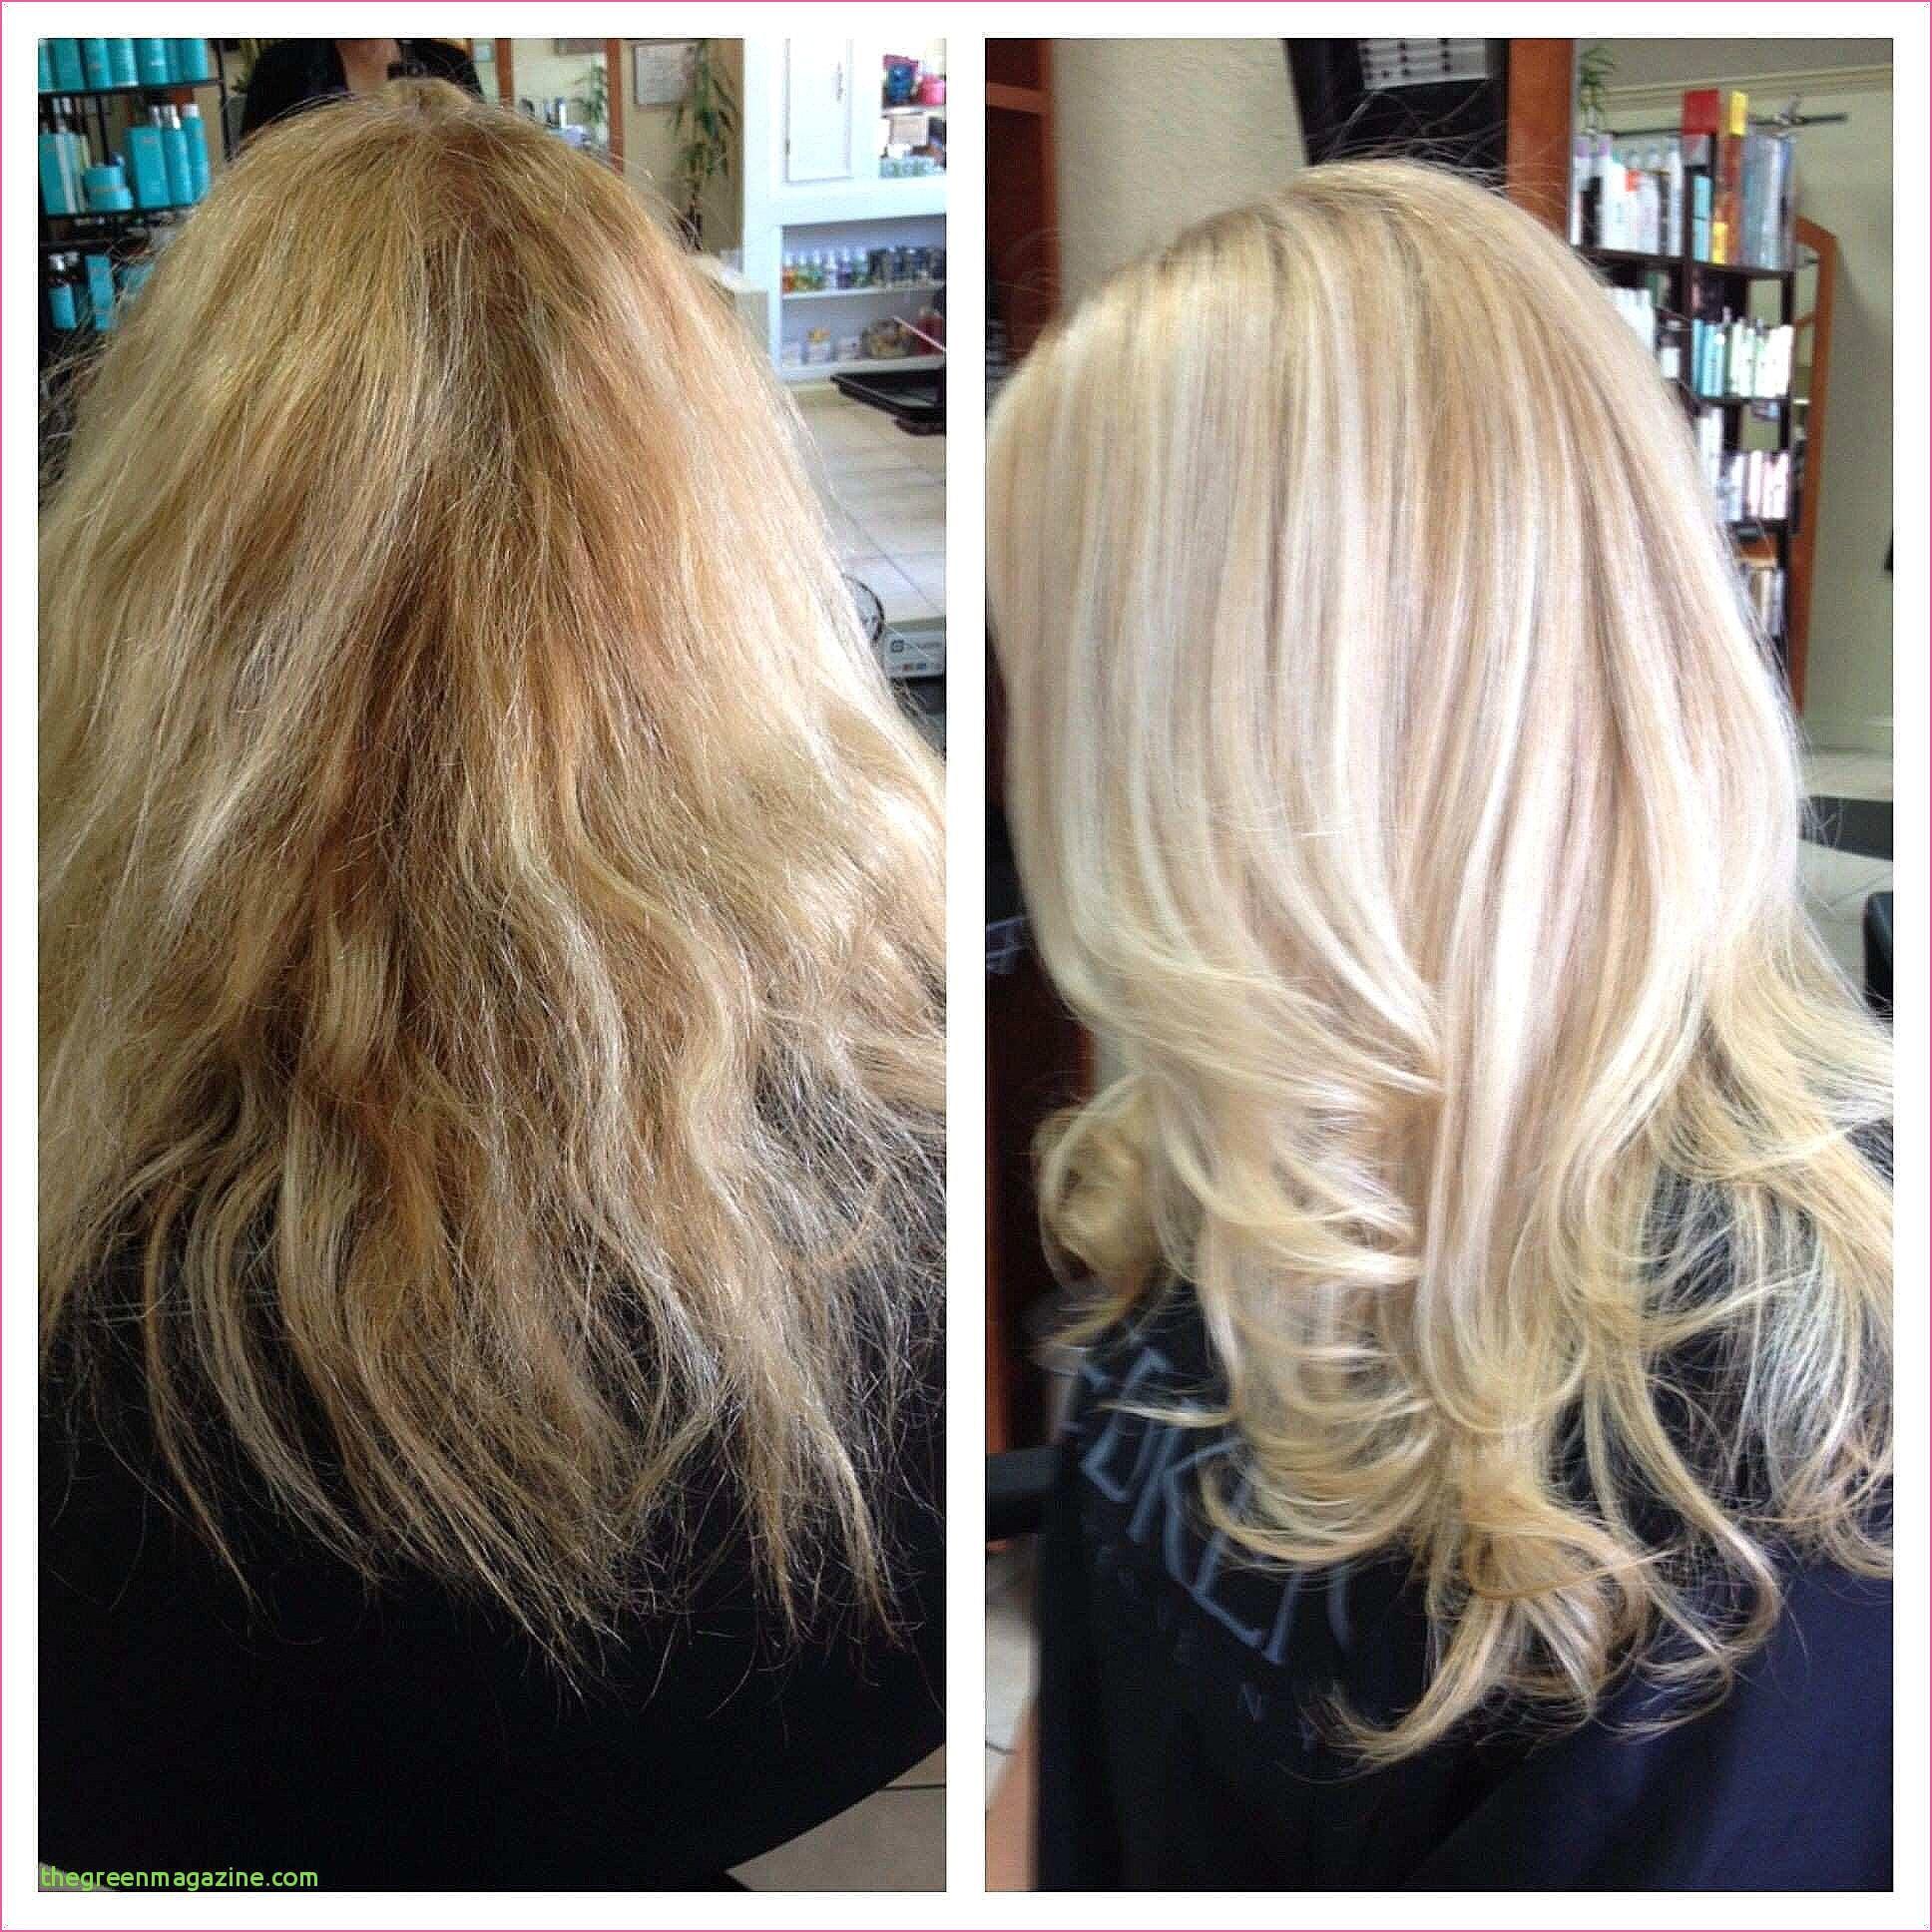 Best Hair Color For Women Over 60 Haarfarben Frauen Coole Frisuren Coole Haarfarben